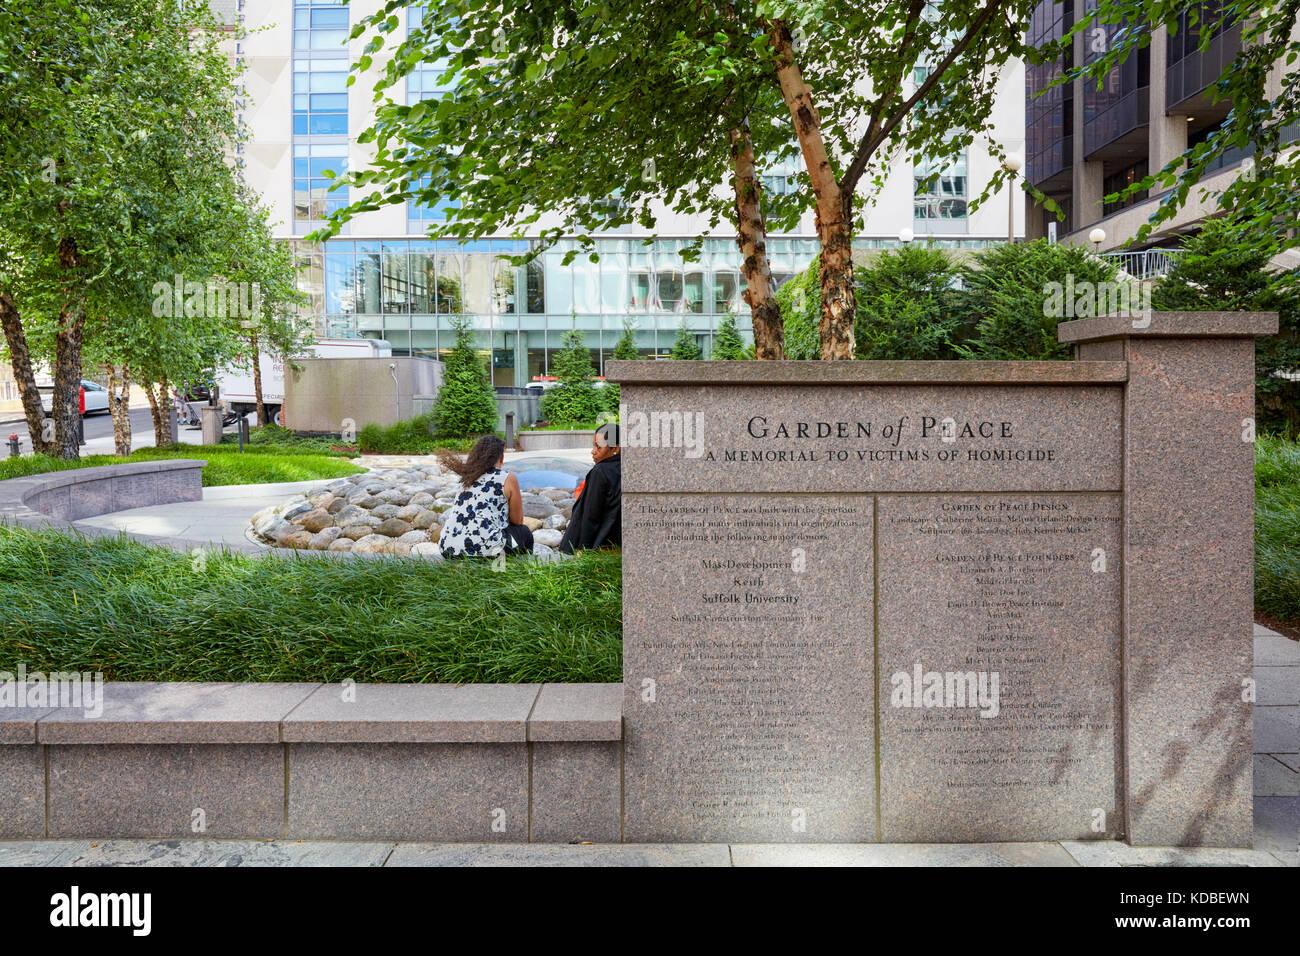 Jardín de la paz, Boston, Massachusetts, EE.UU. Imagen De Stock